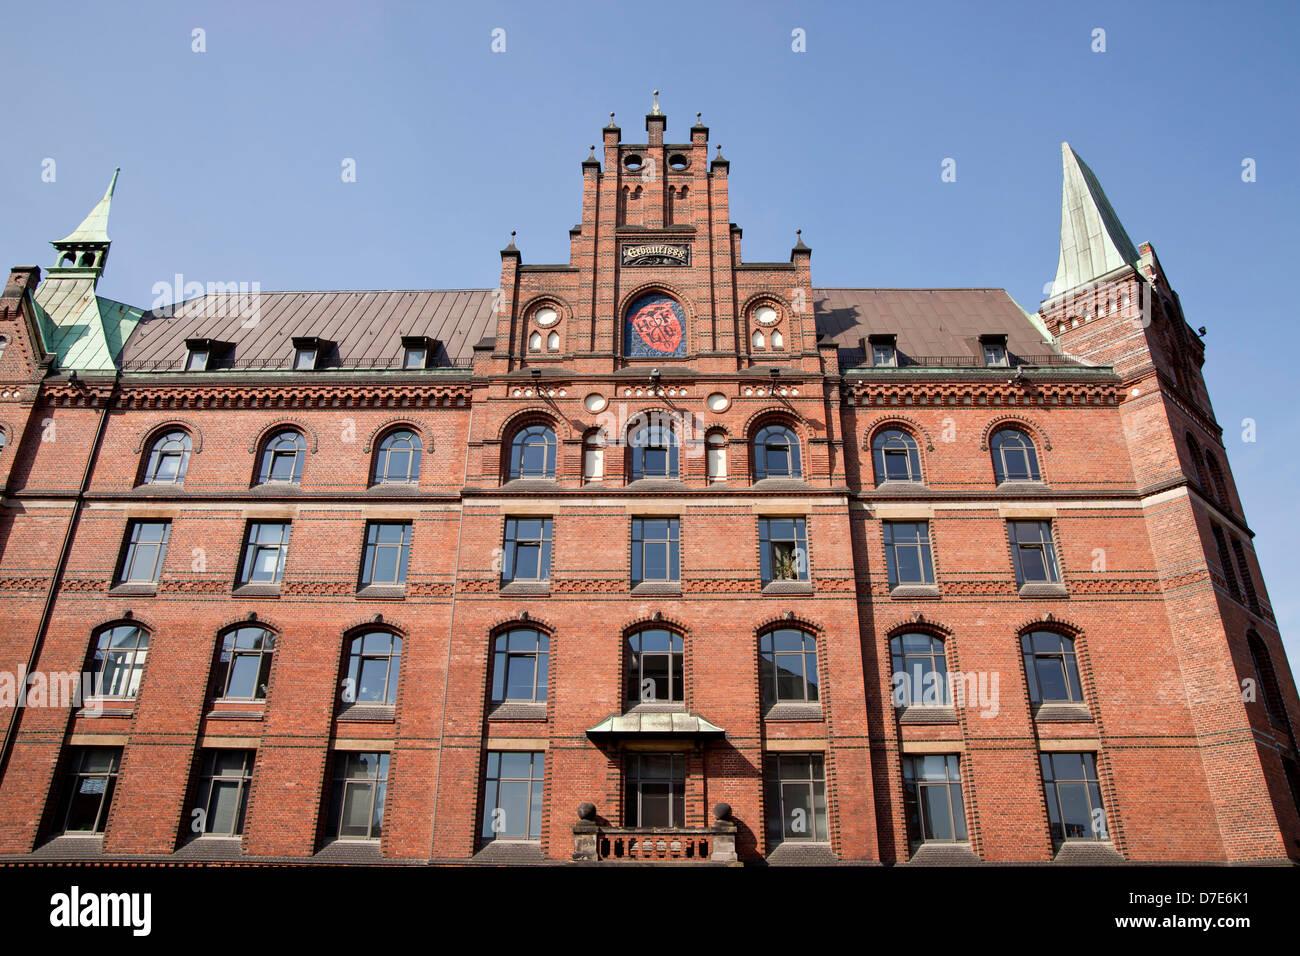 Sandthorquaihof in the Speicherstadt district, Free and Hanseatic City of Hamburg, Germany, Europe Stock Photo